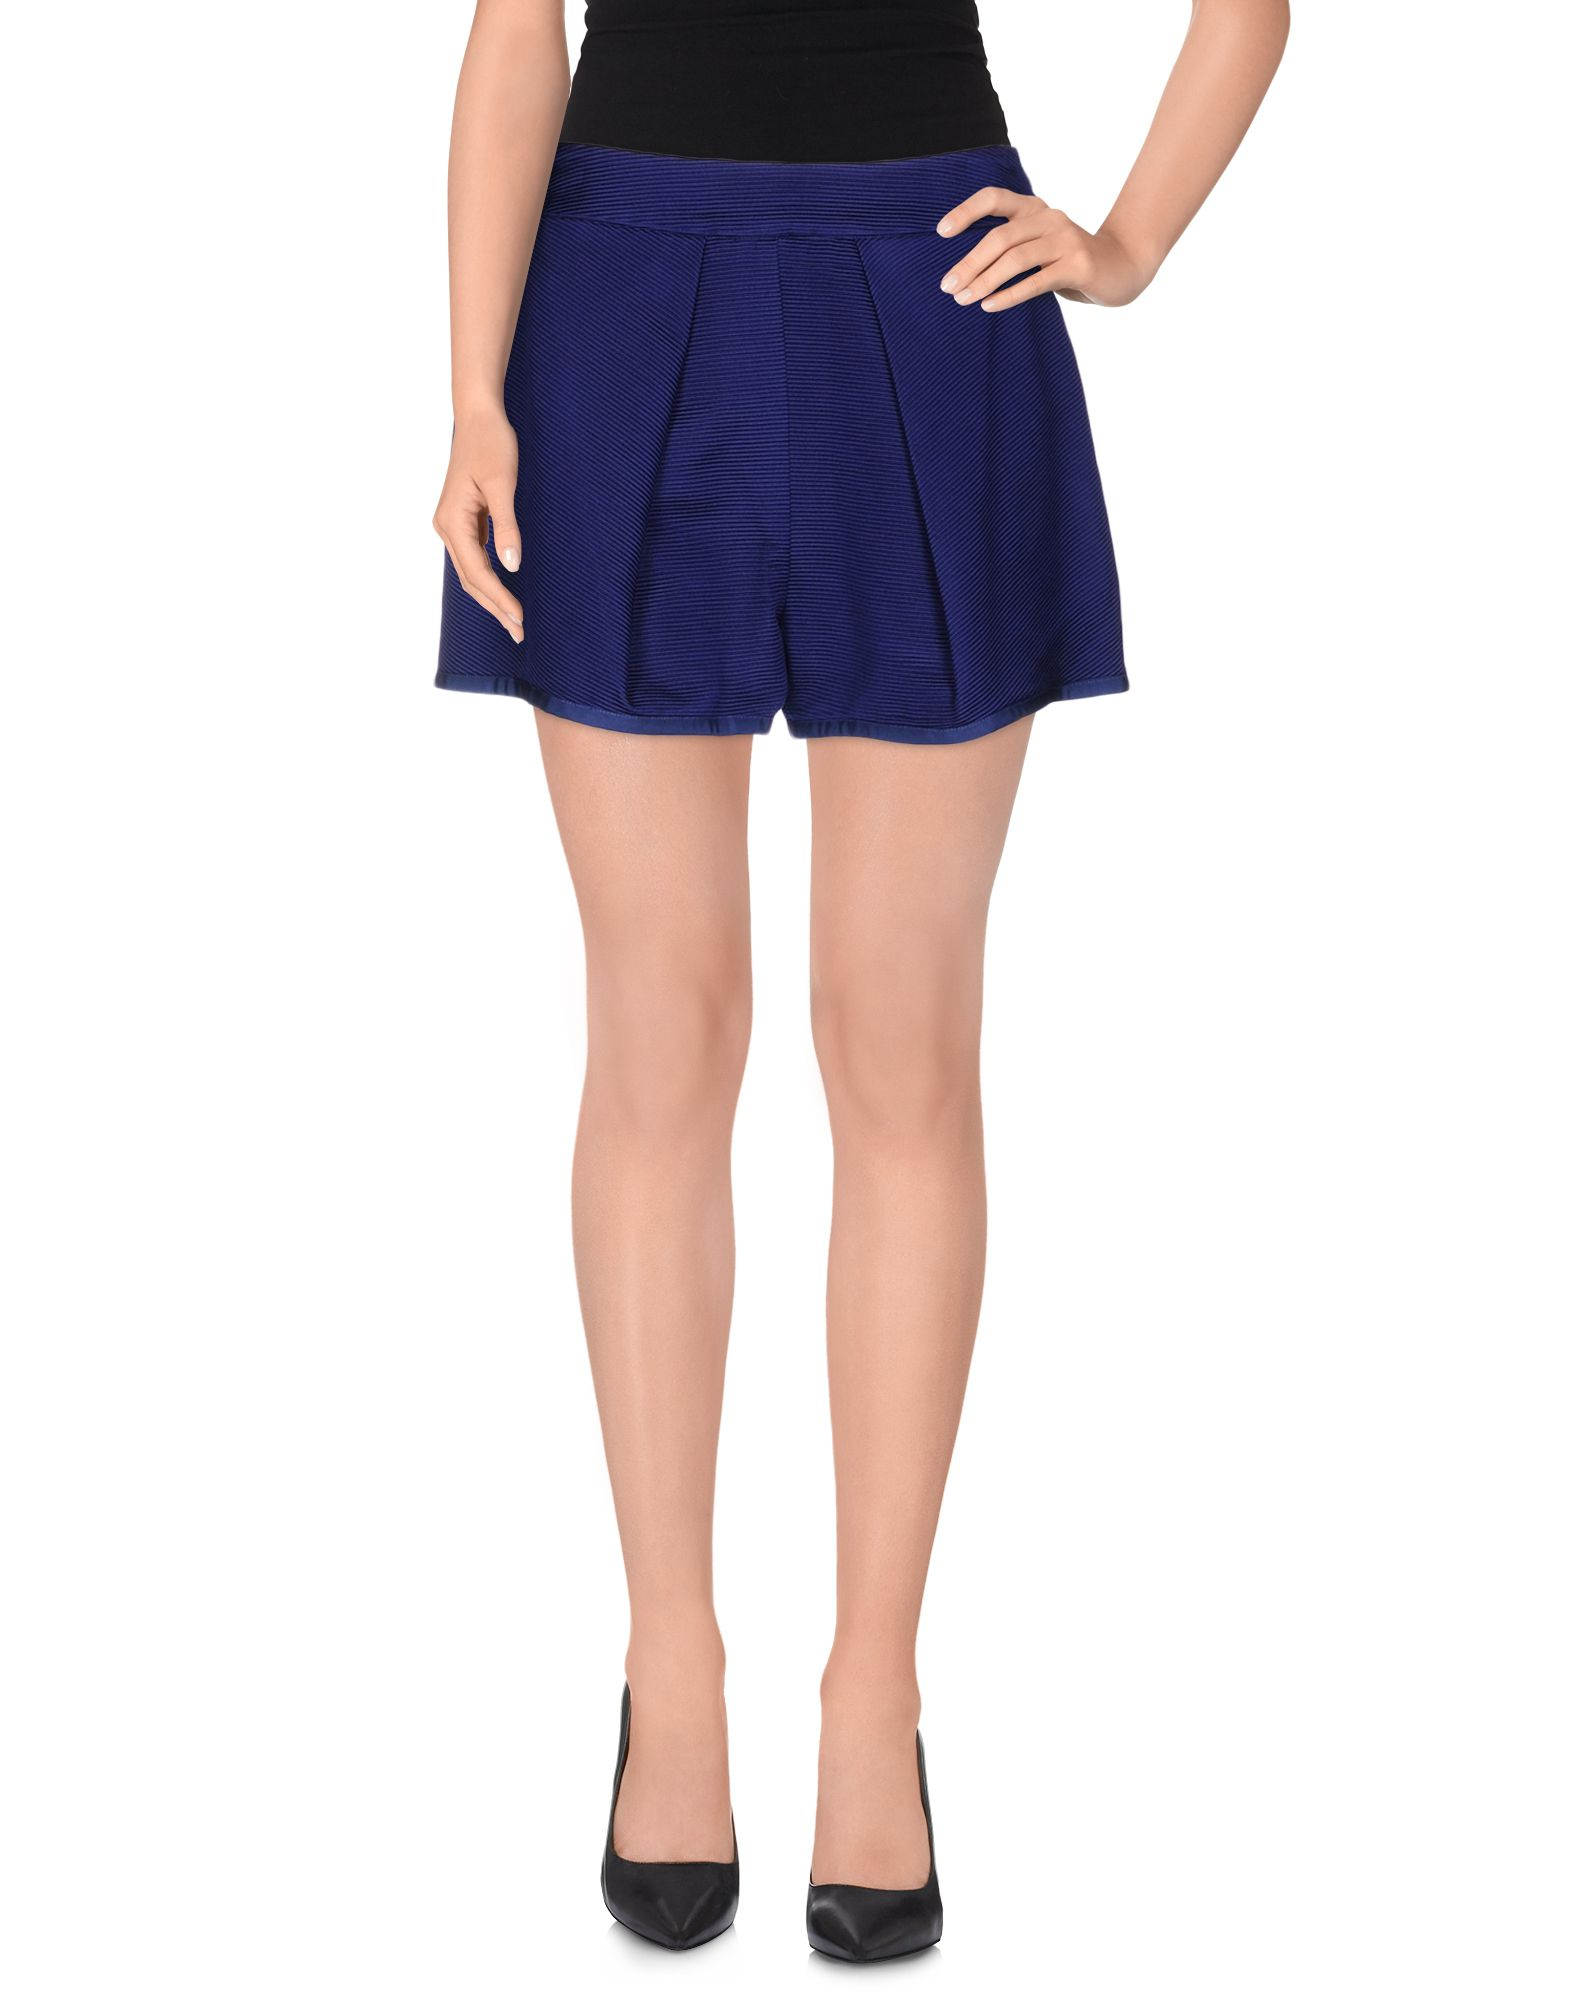 camilla and marc female camilla and marc shorts